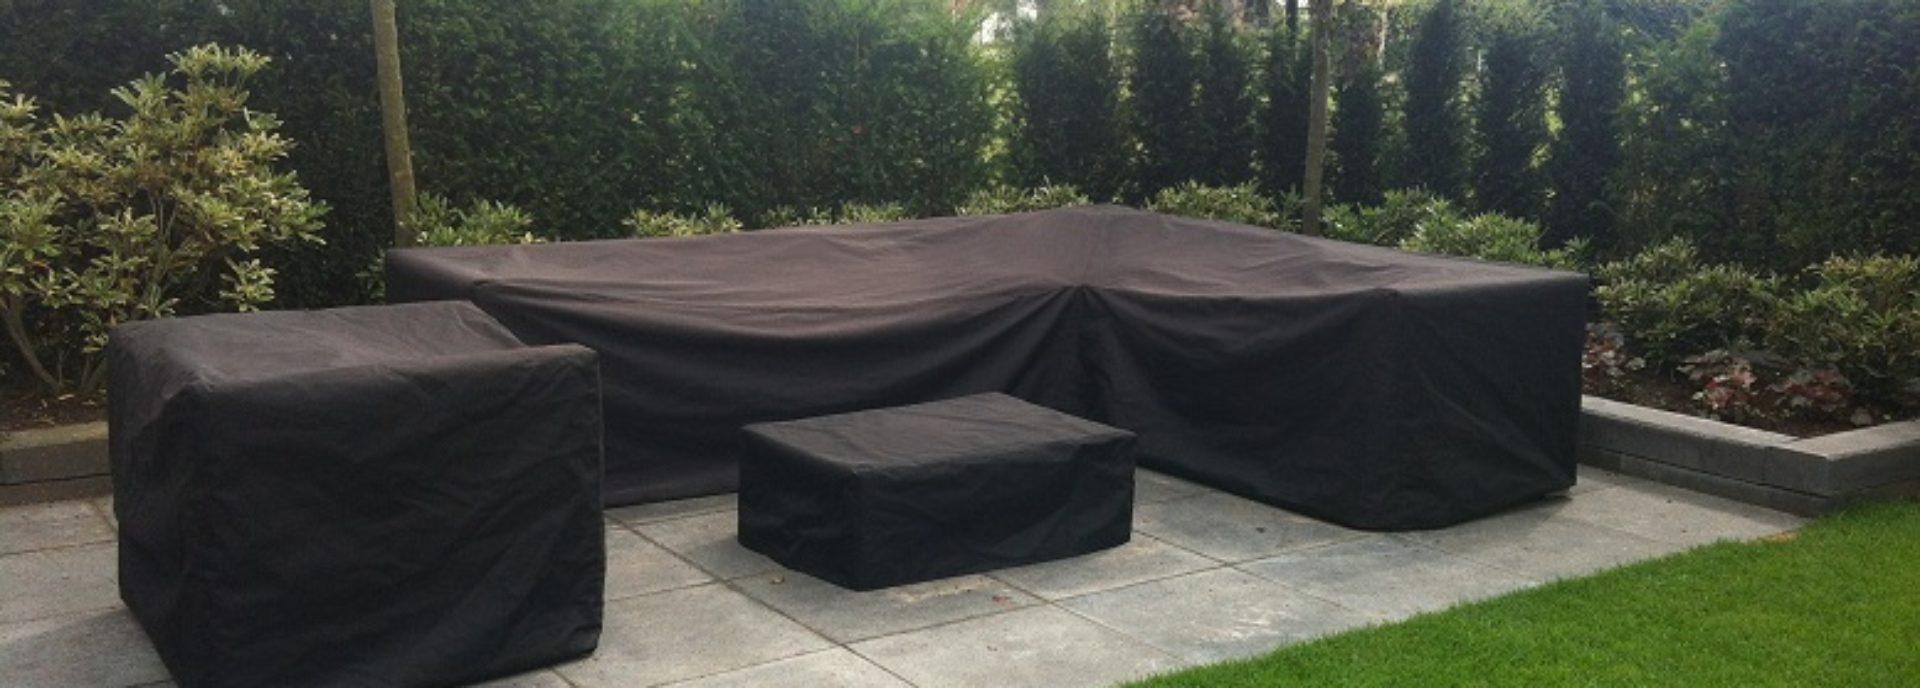 Fundas para muebles de jardin for Mobiliario para exteriores